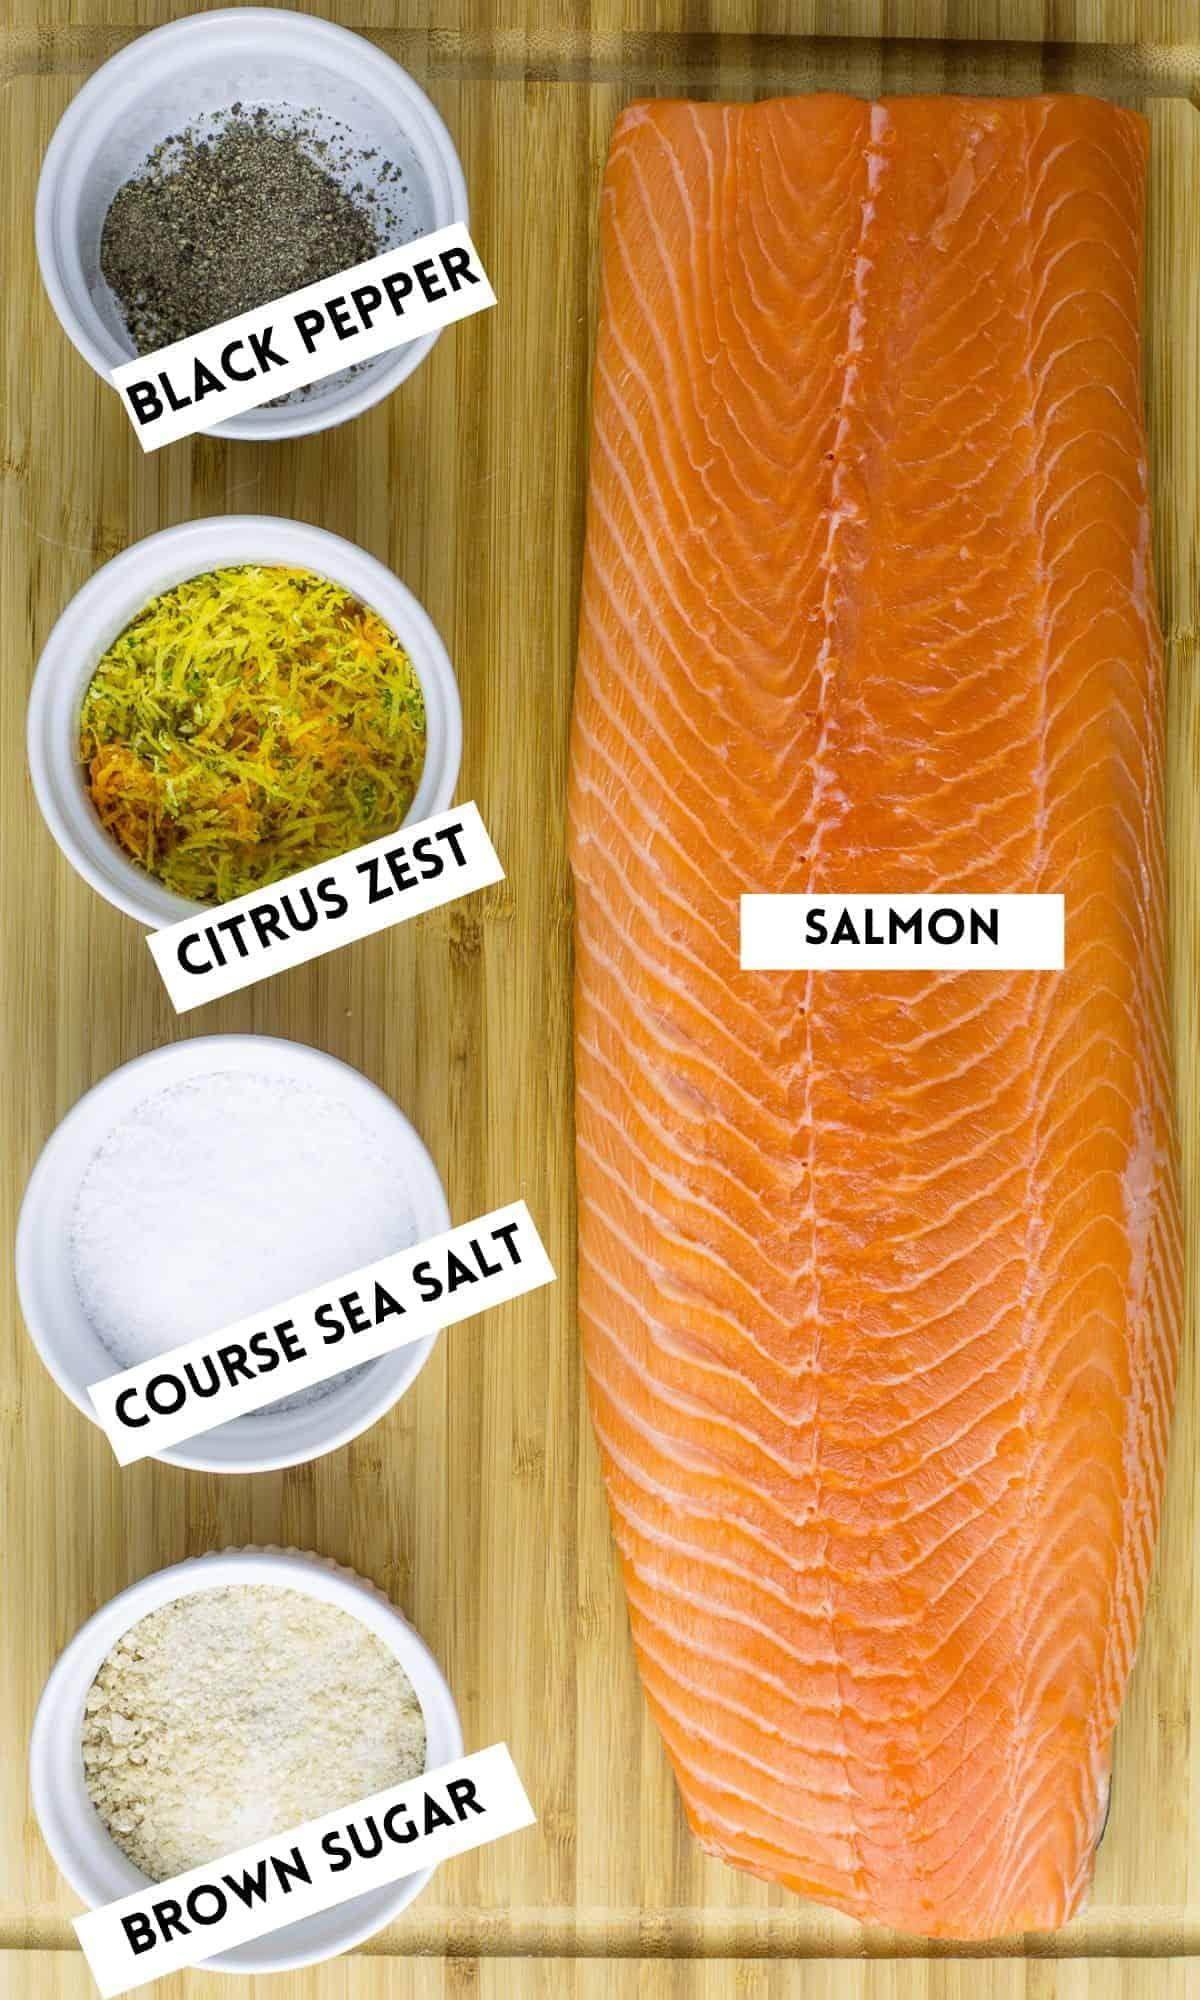 salmon citrus zest salt and pepper on wooden board